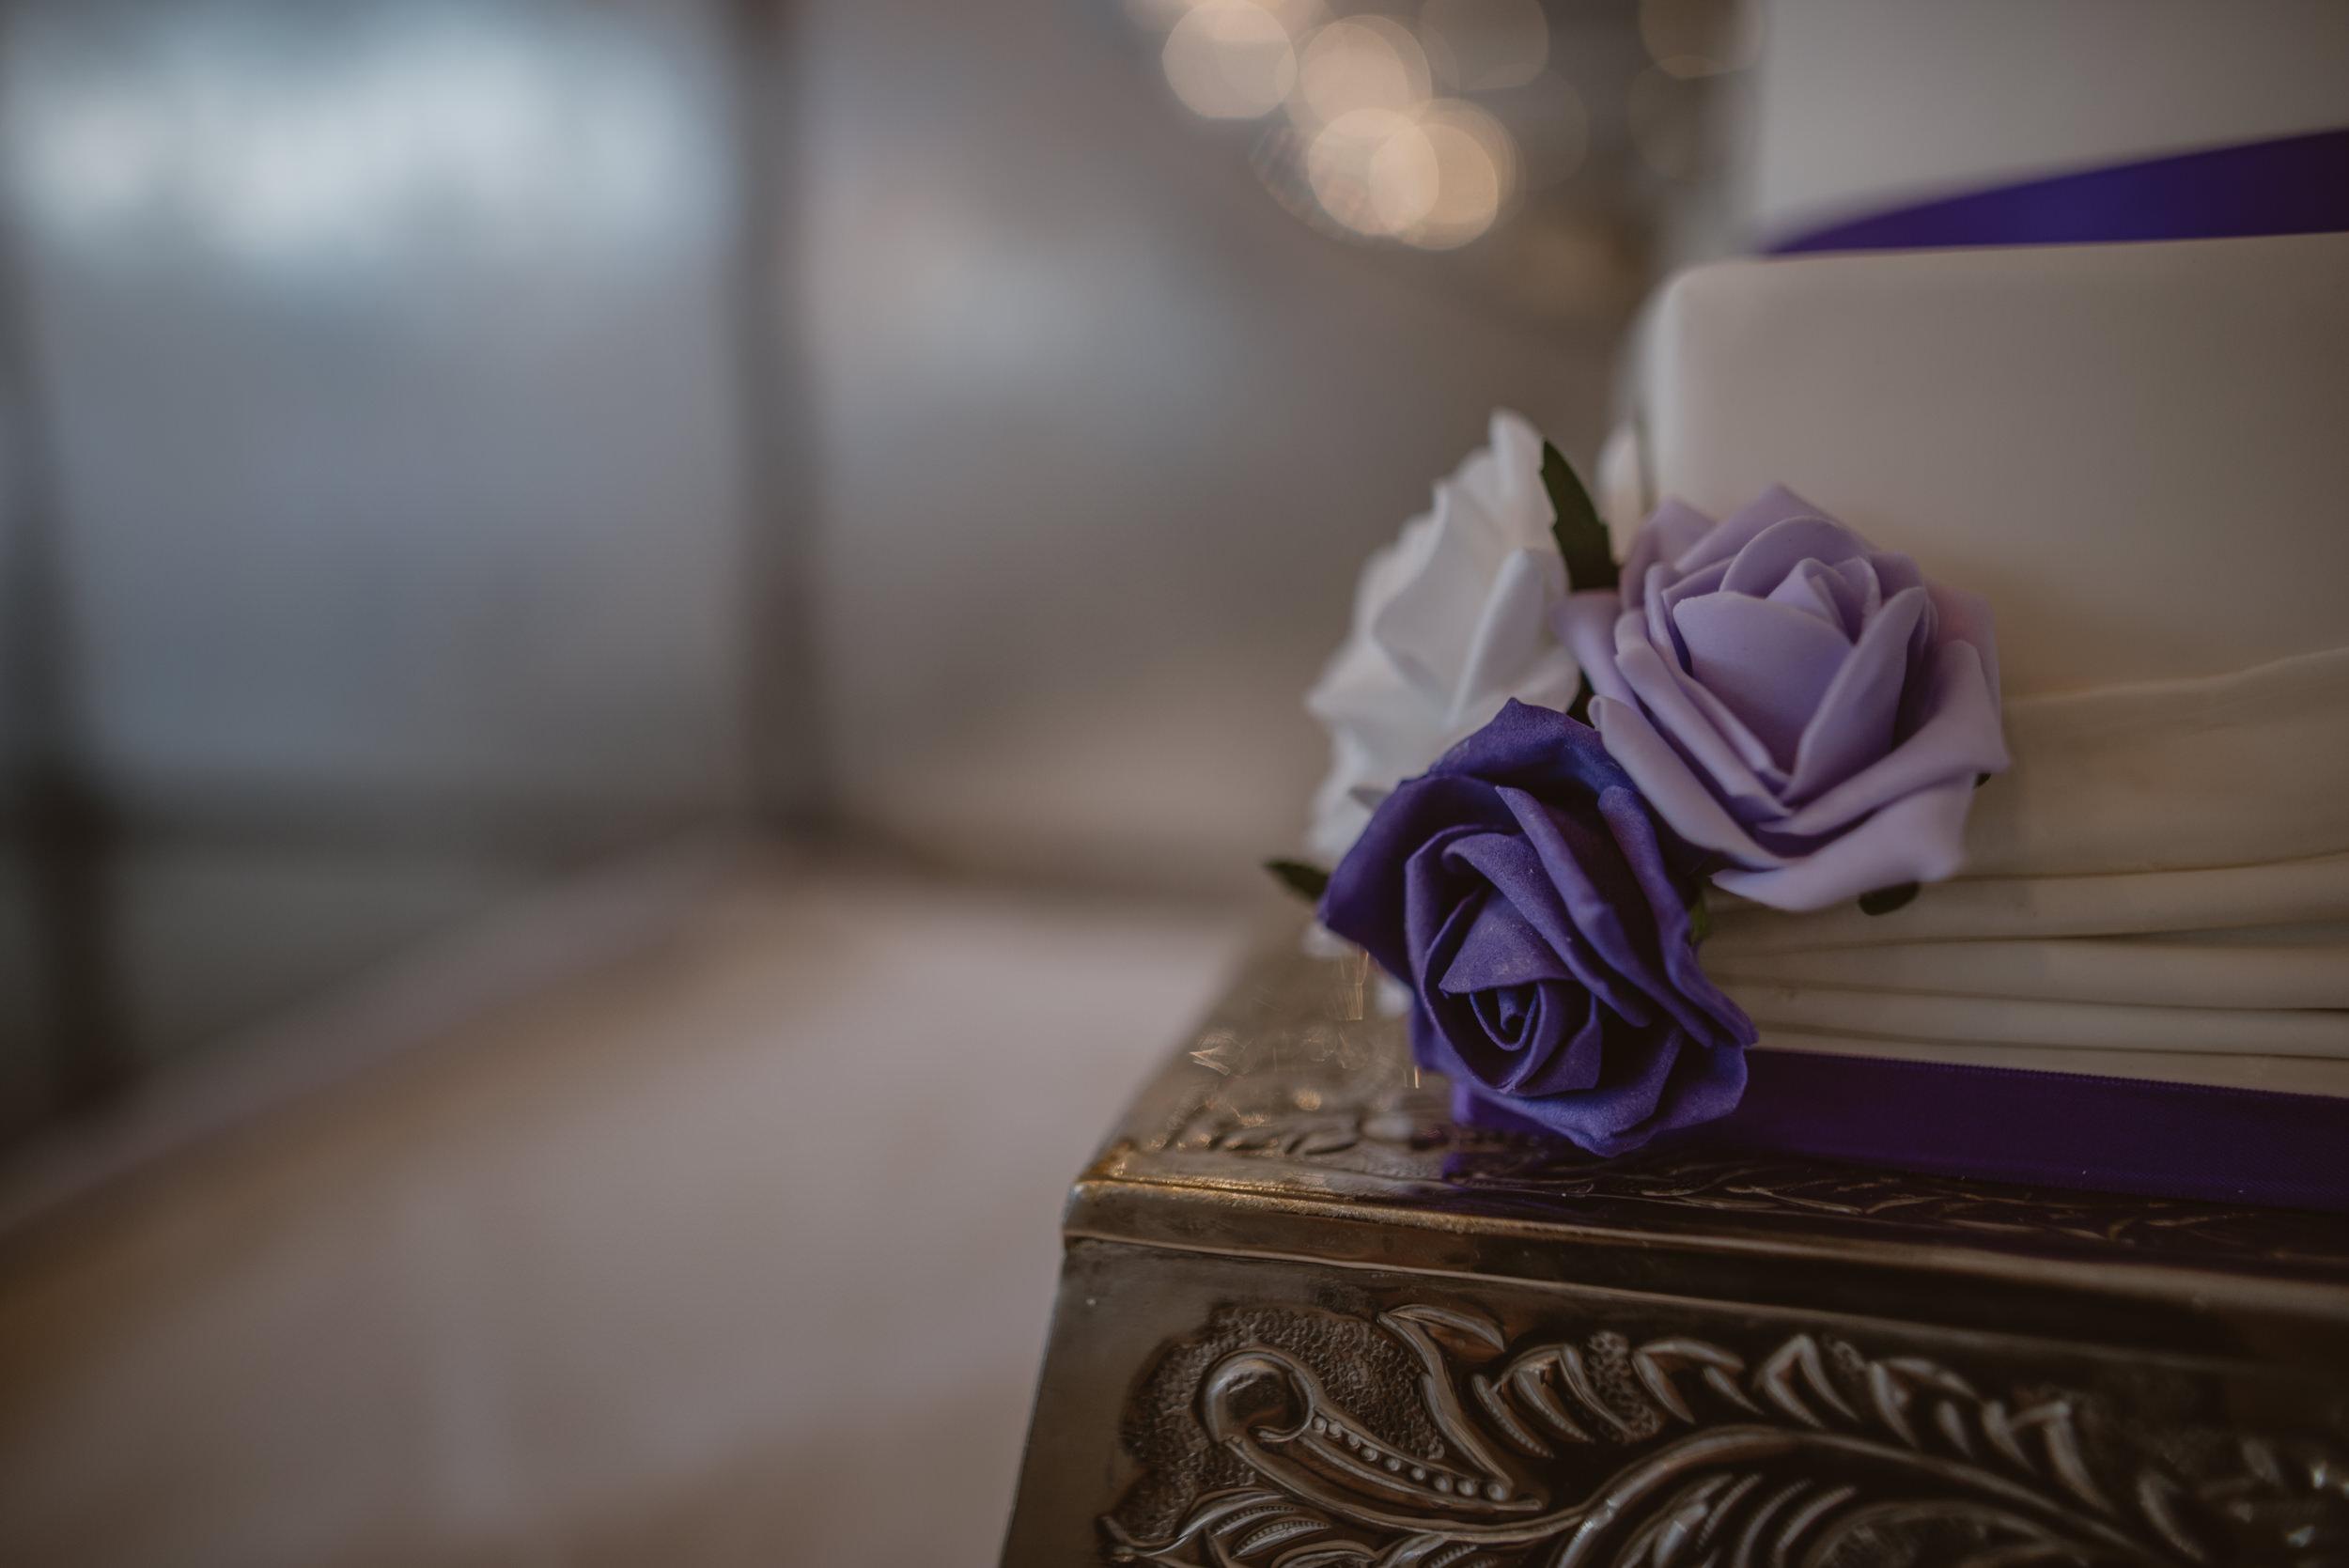 Chantelle-and-Stephen-Old-Thorns-Hotel-Wedding-Liphook-Manu-Mendoza-Wedding-Photography-332.jpg